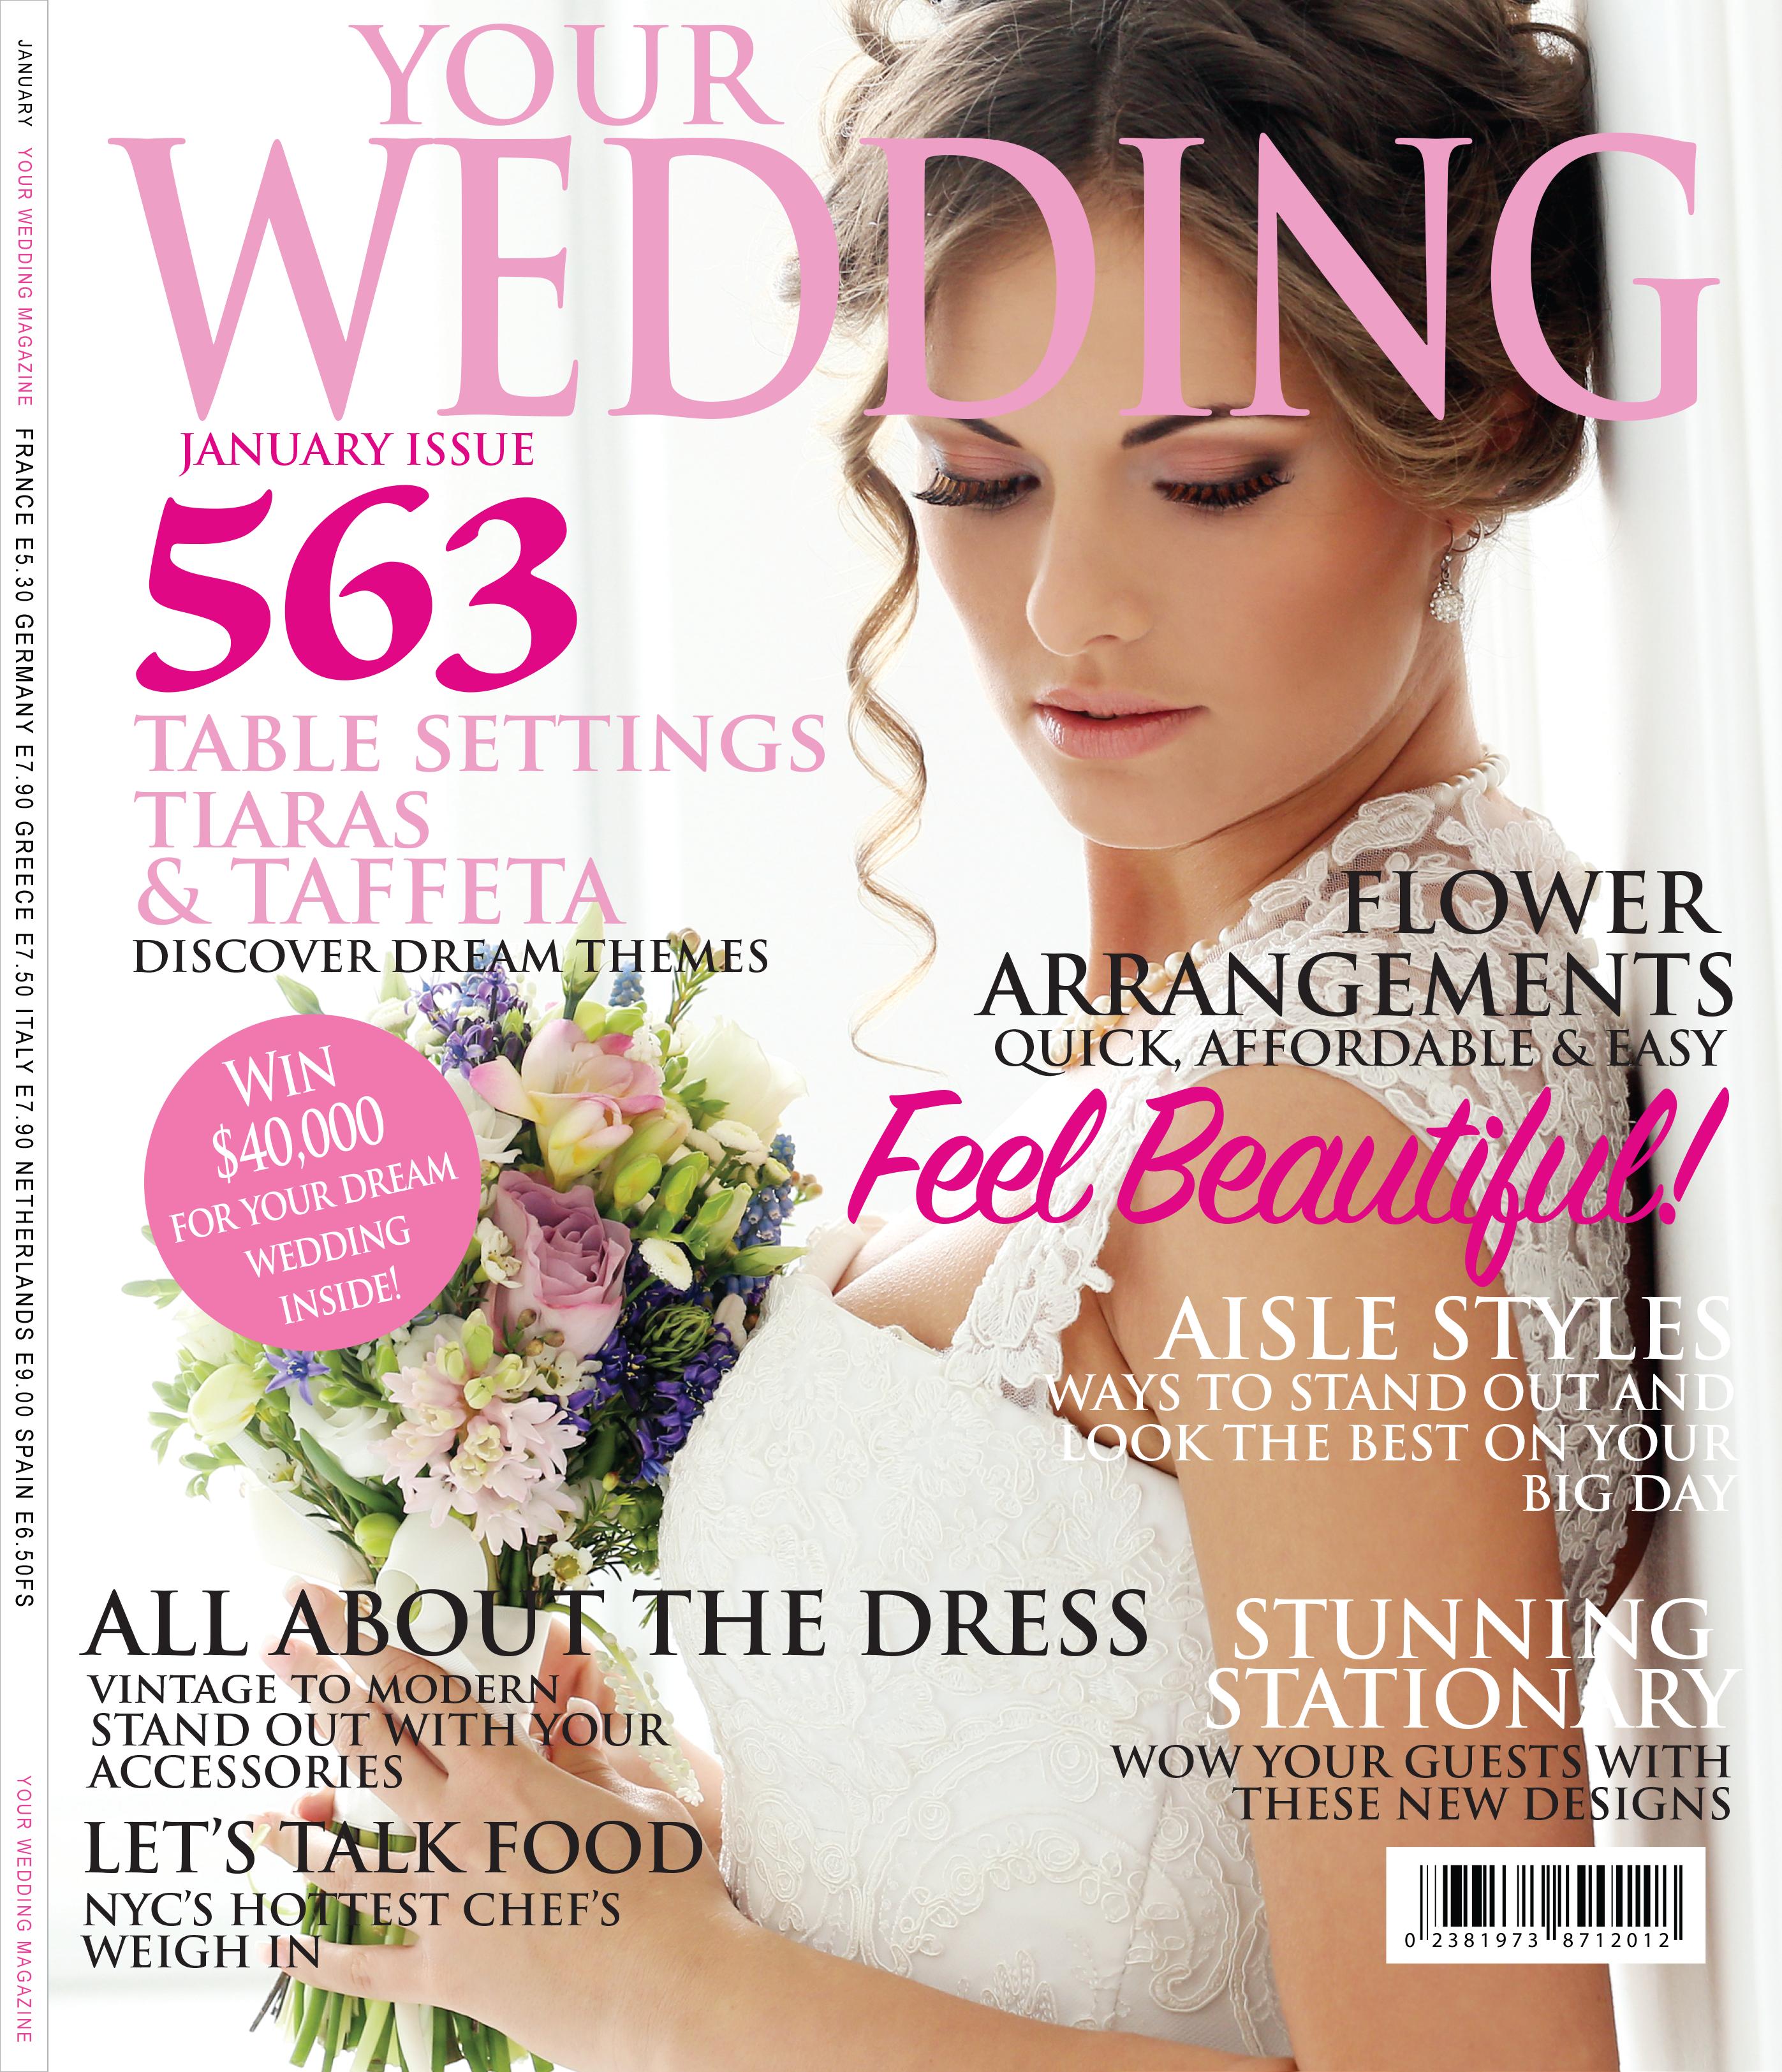 WEDDING MAGAZINE COVER